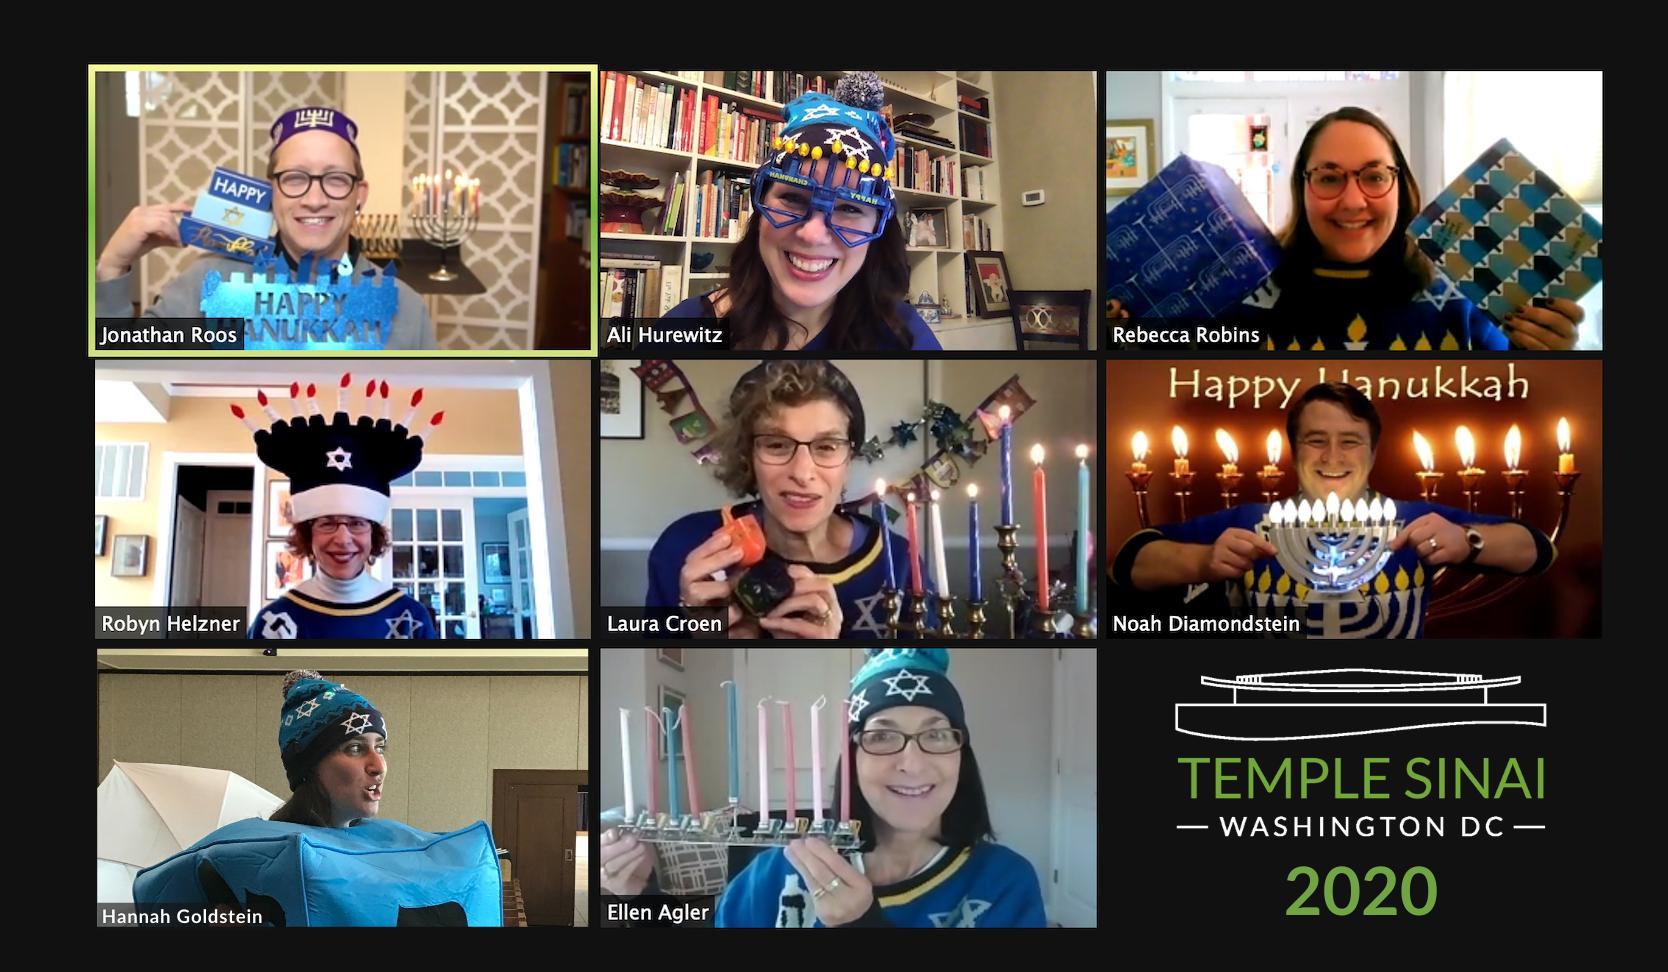 Temple Sinai's Ritual and Director Staff